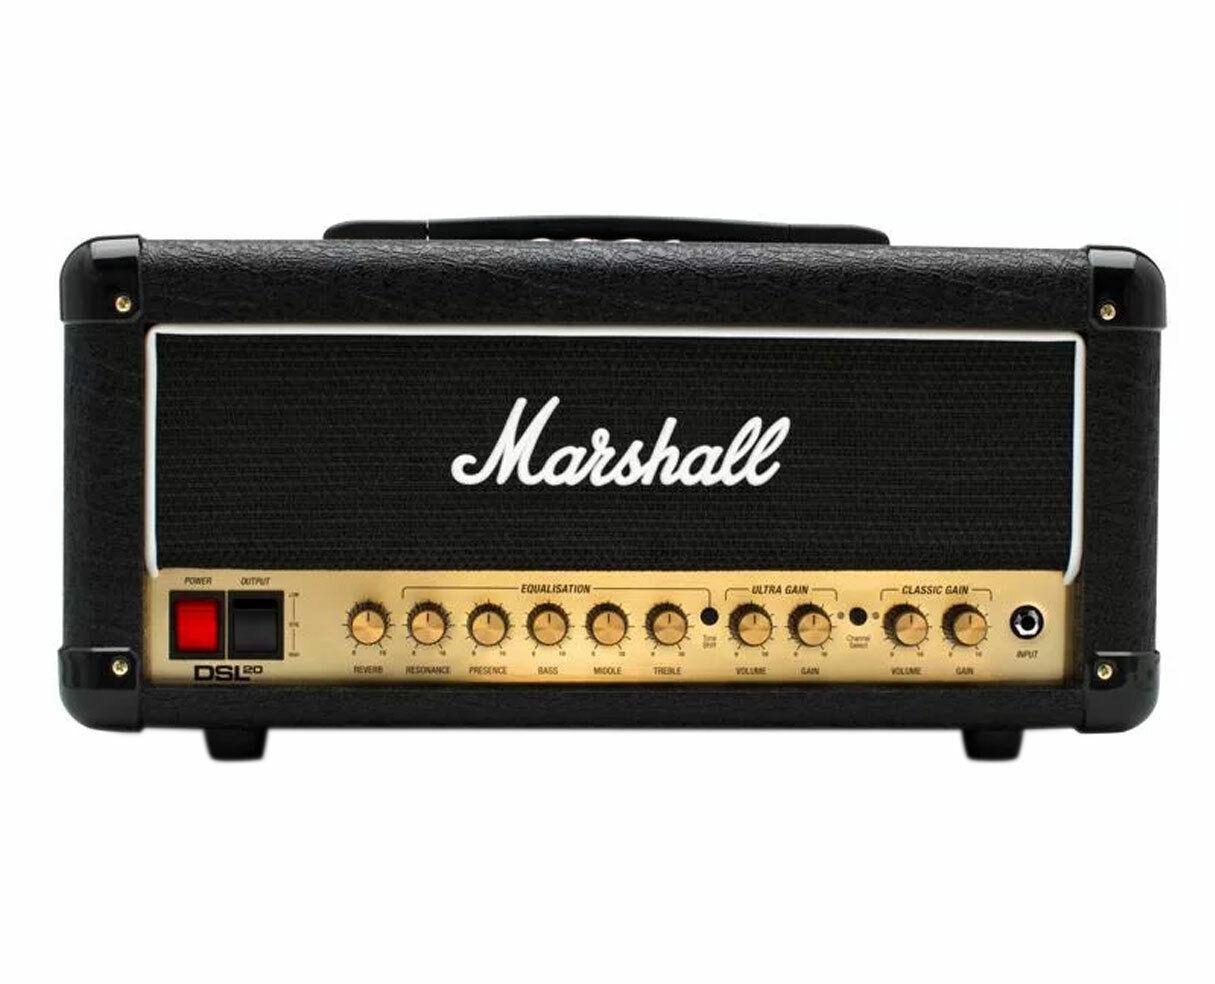 Marshall DSL20HR 20-Watt Guitar Head --. Buy it now for 419.99